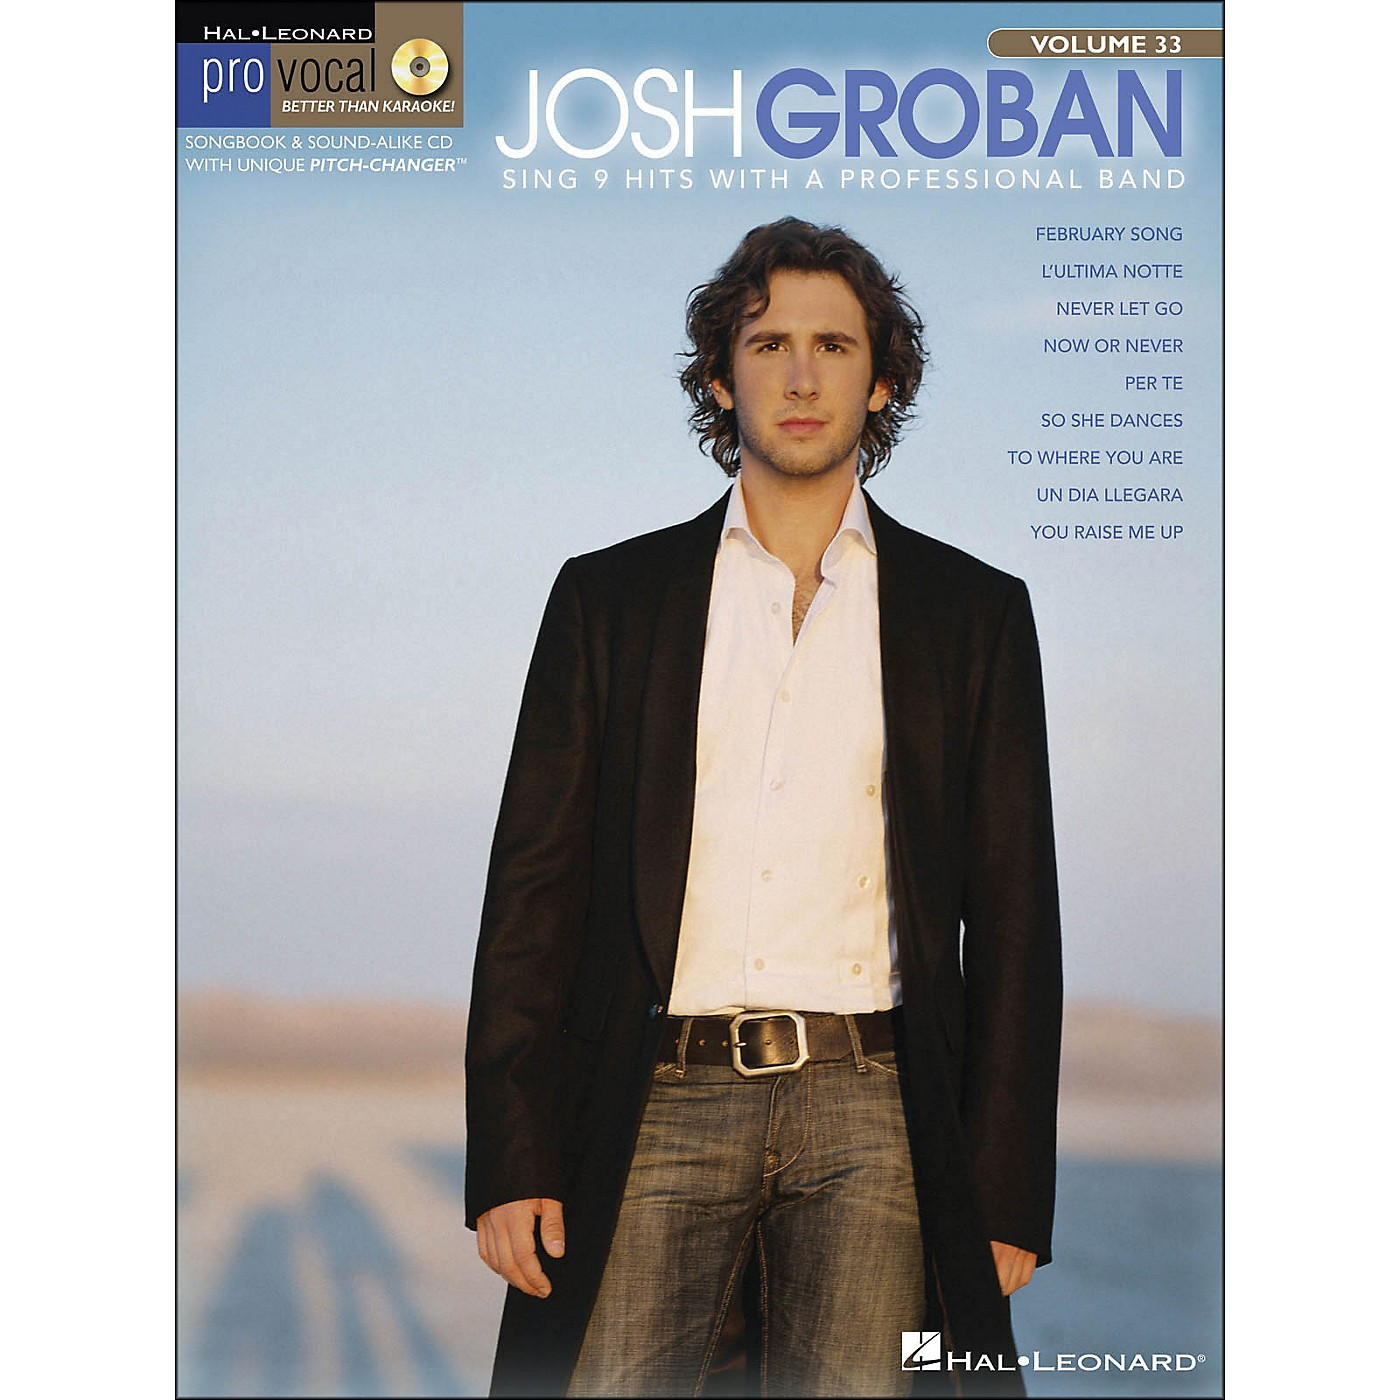 Hal Leonard Josh Groban - Pro Vocal Series for Male Singers Volume 33 Book/CD thumbnail